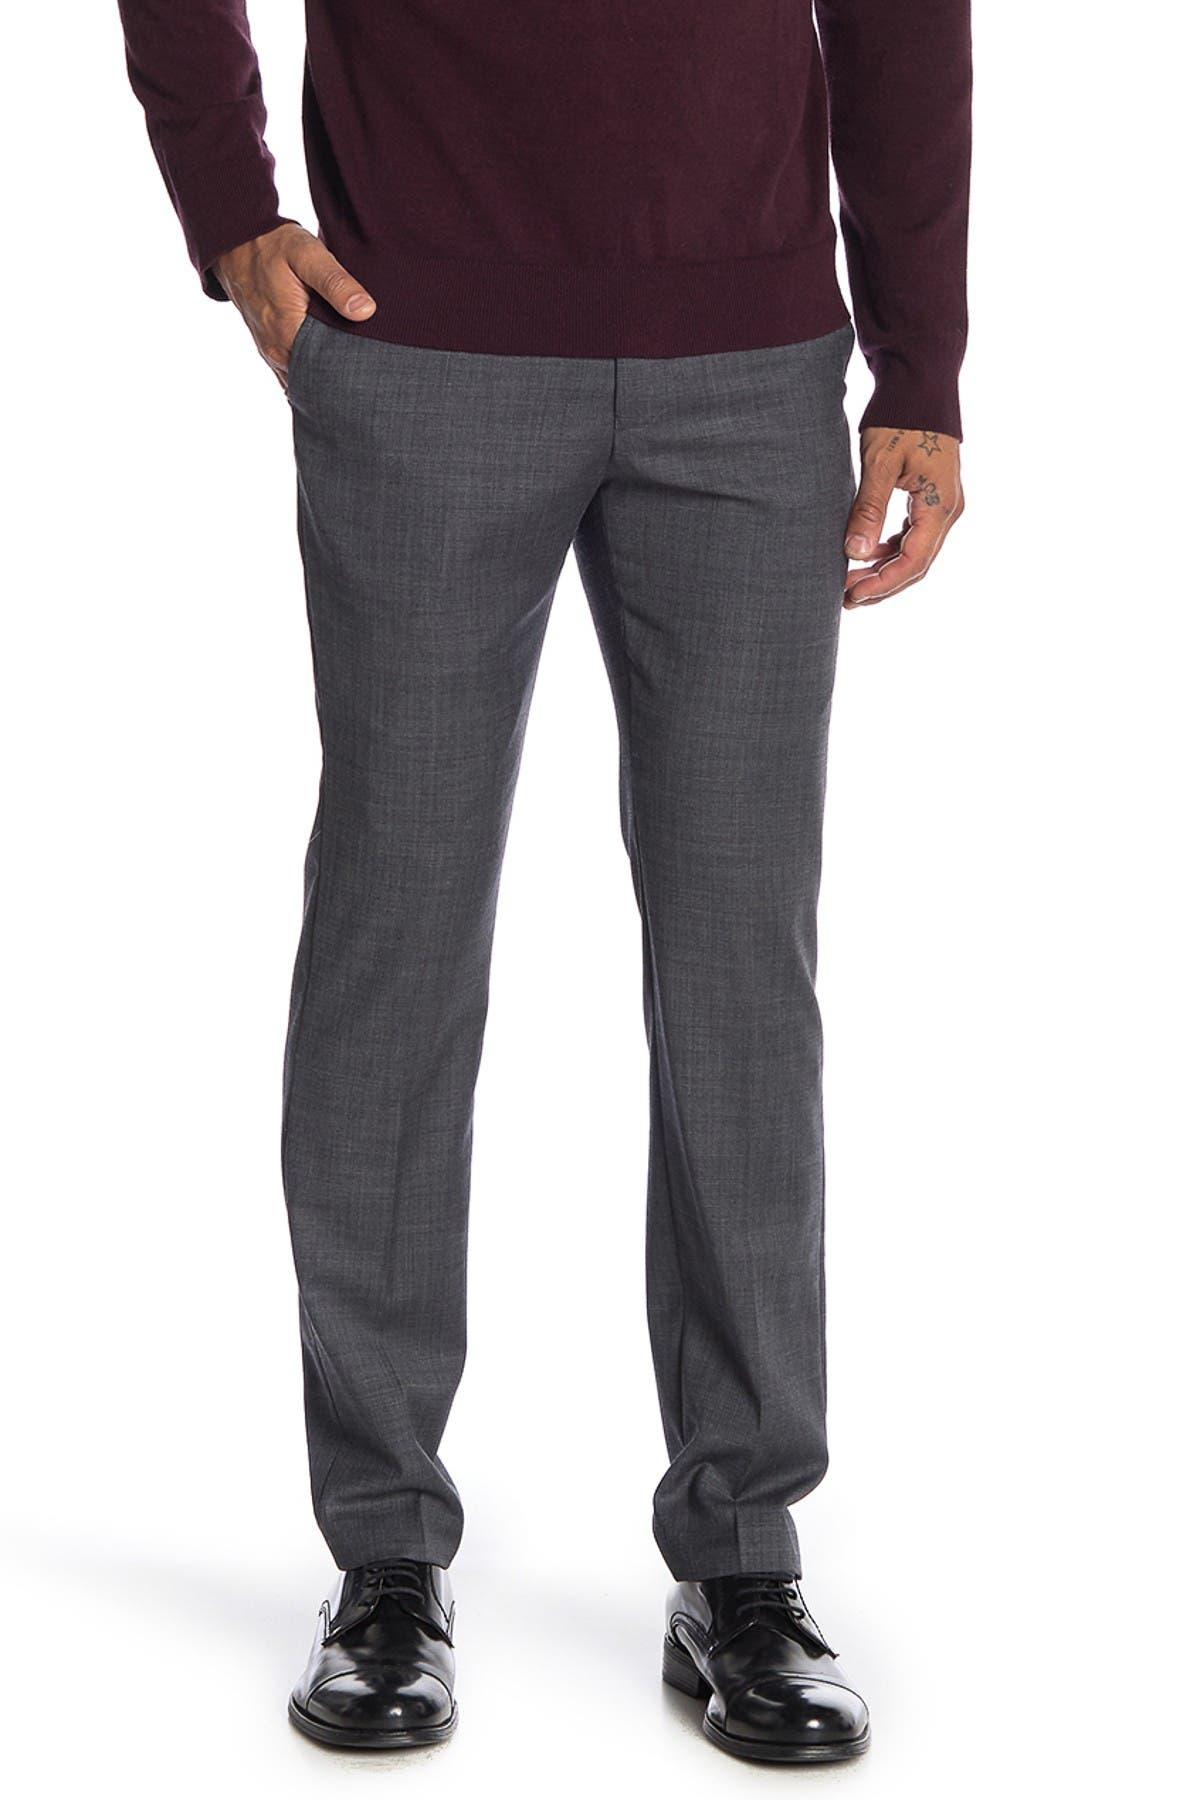 "Image of Original Penguin Charcoal Solid Trim Fit Suit Separates Trousers - 30-34"" Inseam"